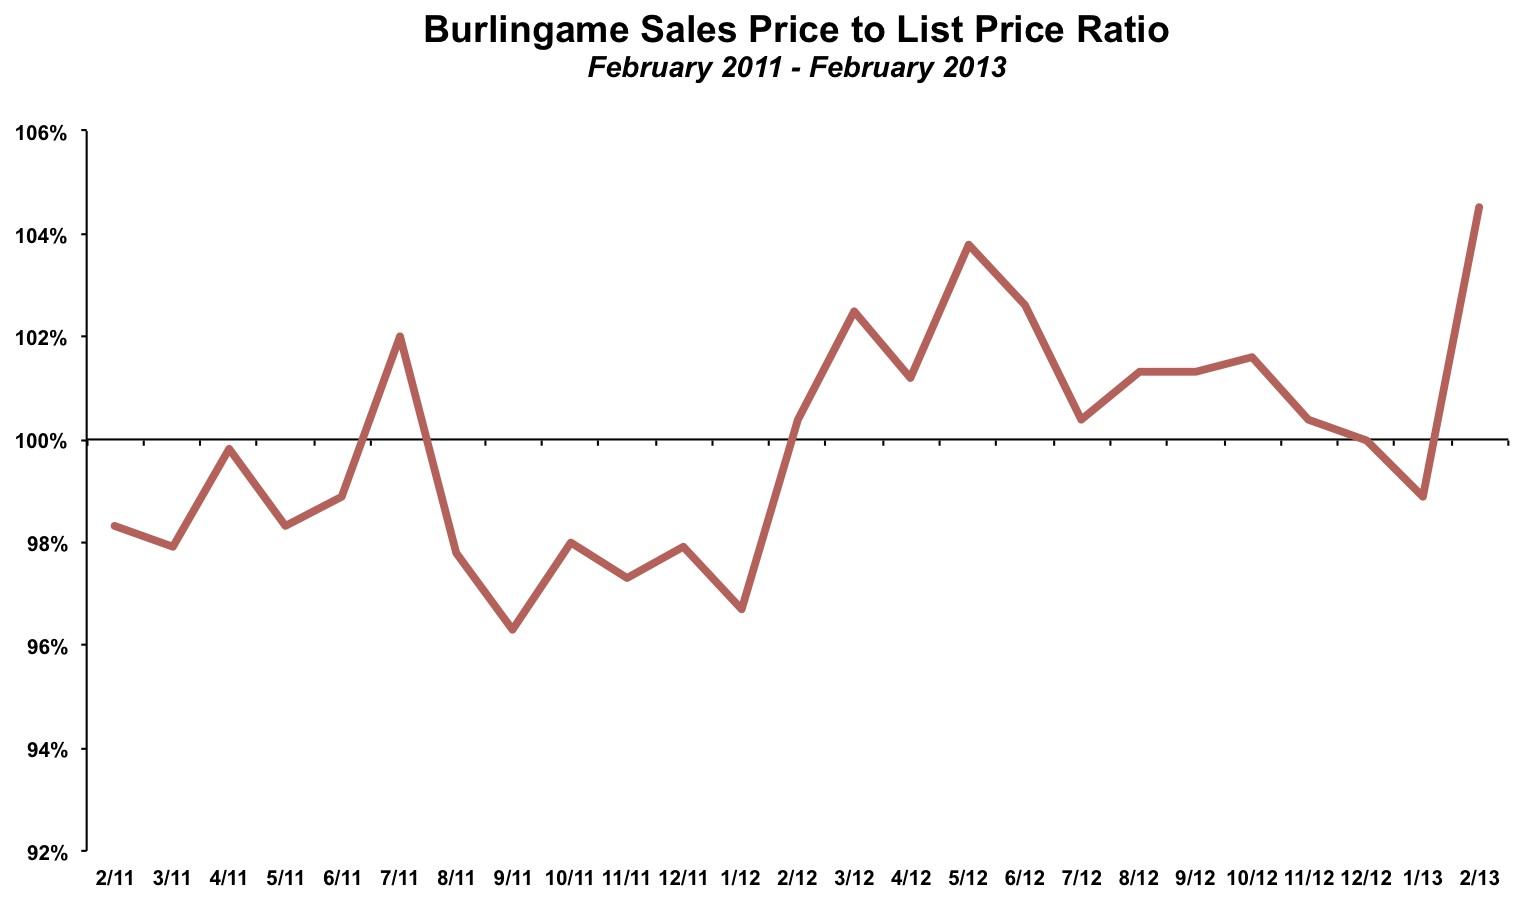 Sales Price List Price Ratio Burlingame February 2013